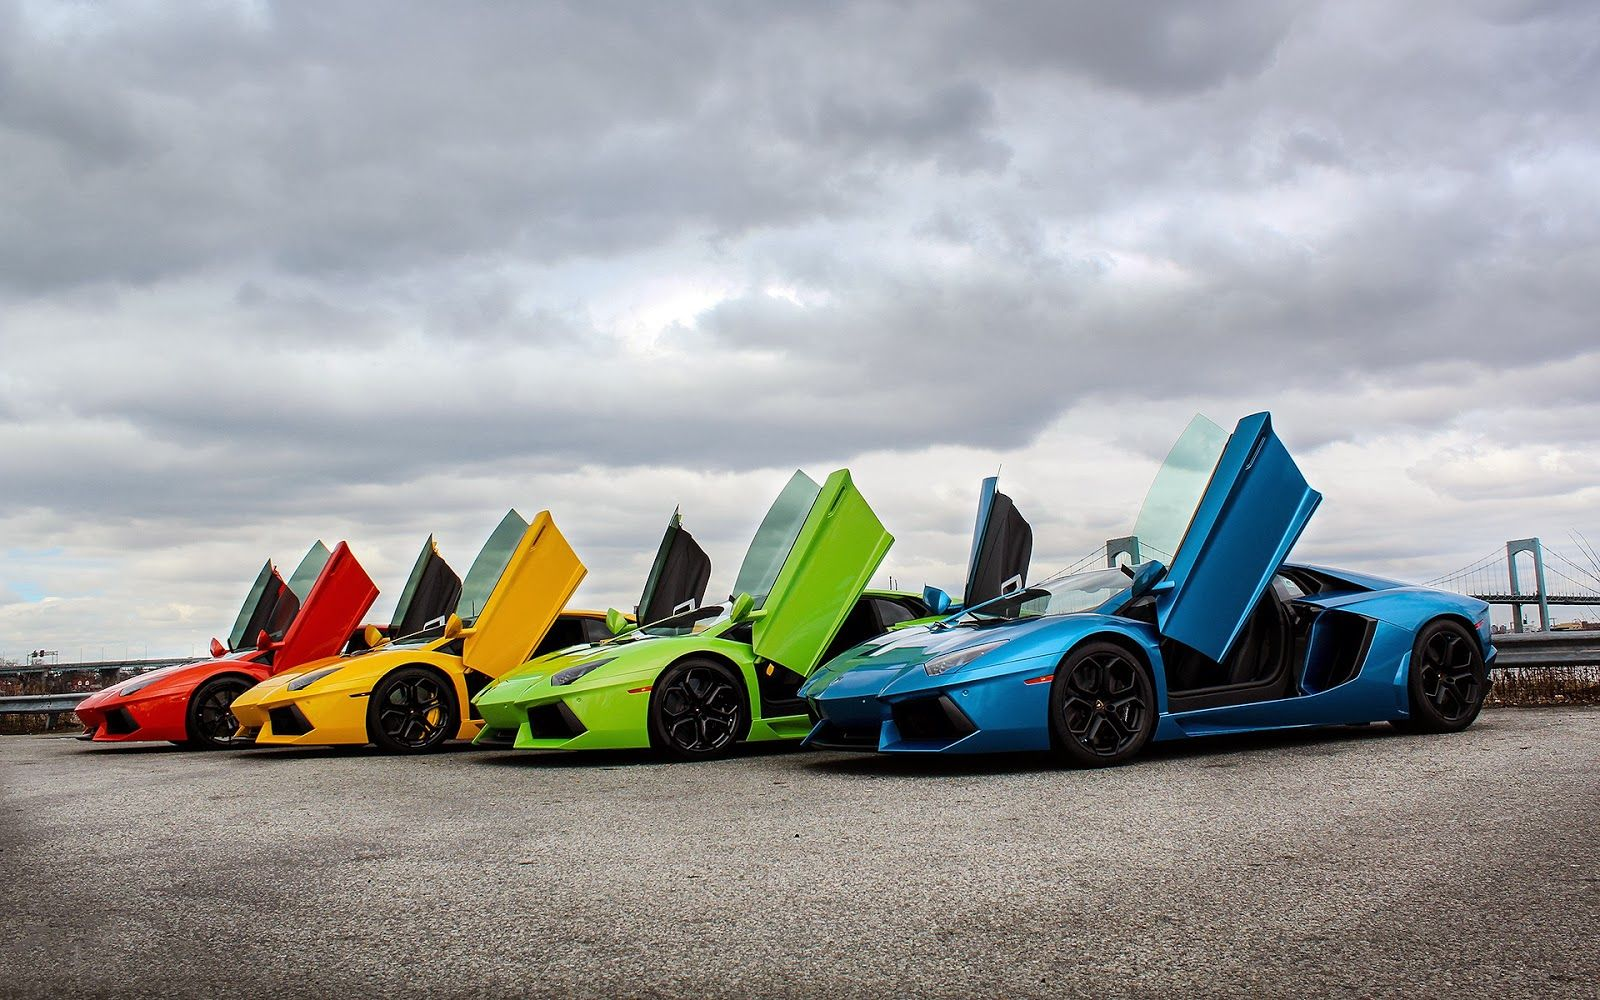 Wallpapers Green And Lamborghini On Pinterest: Undefined Lamborghini Veneno Wallpaper (53 Wallpapers